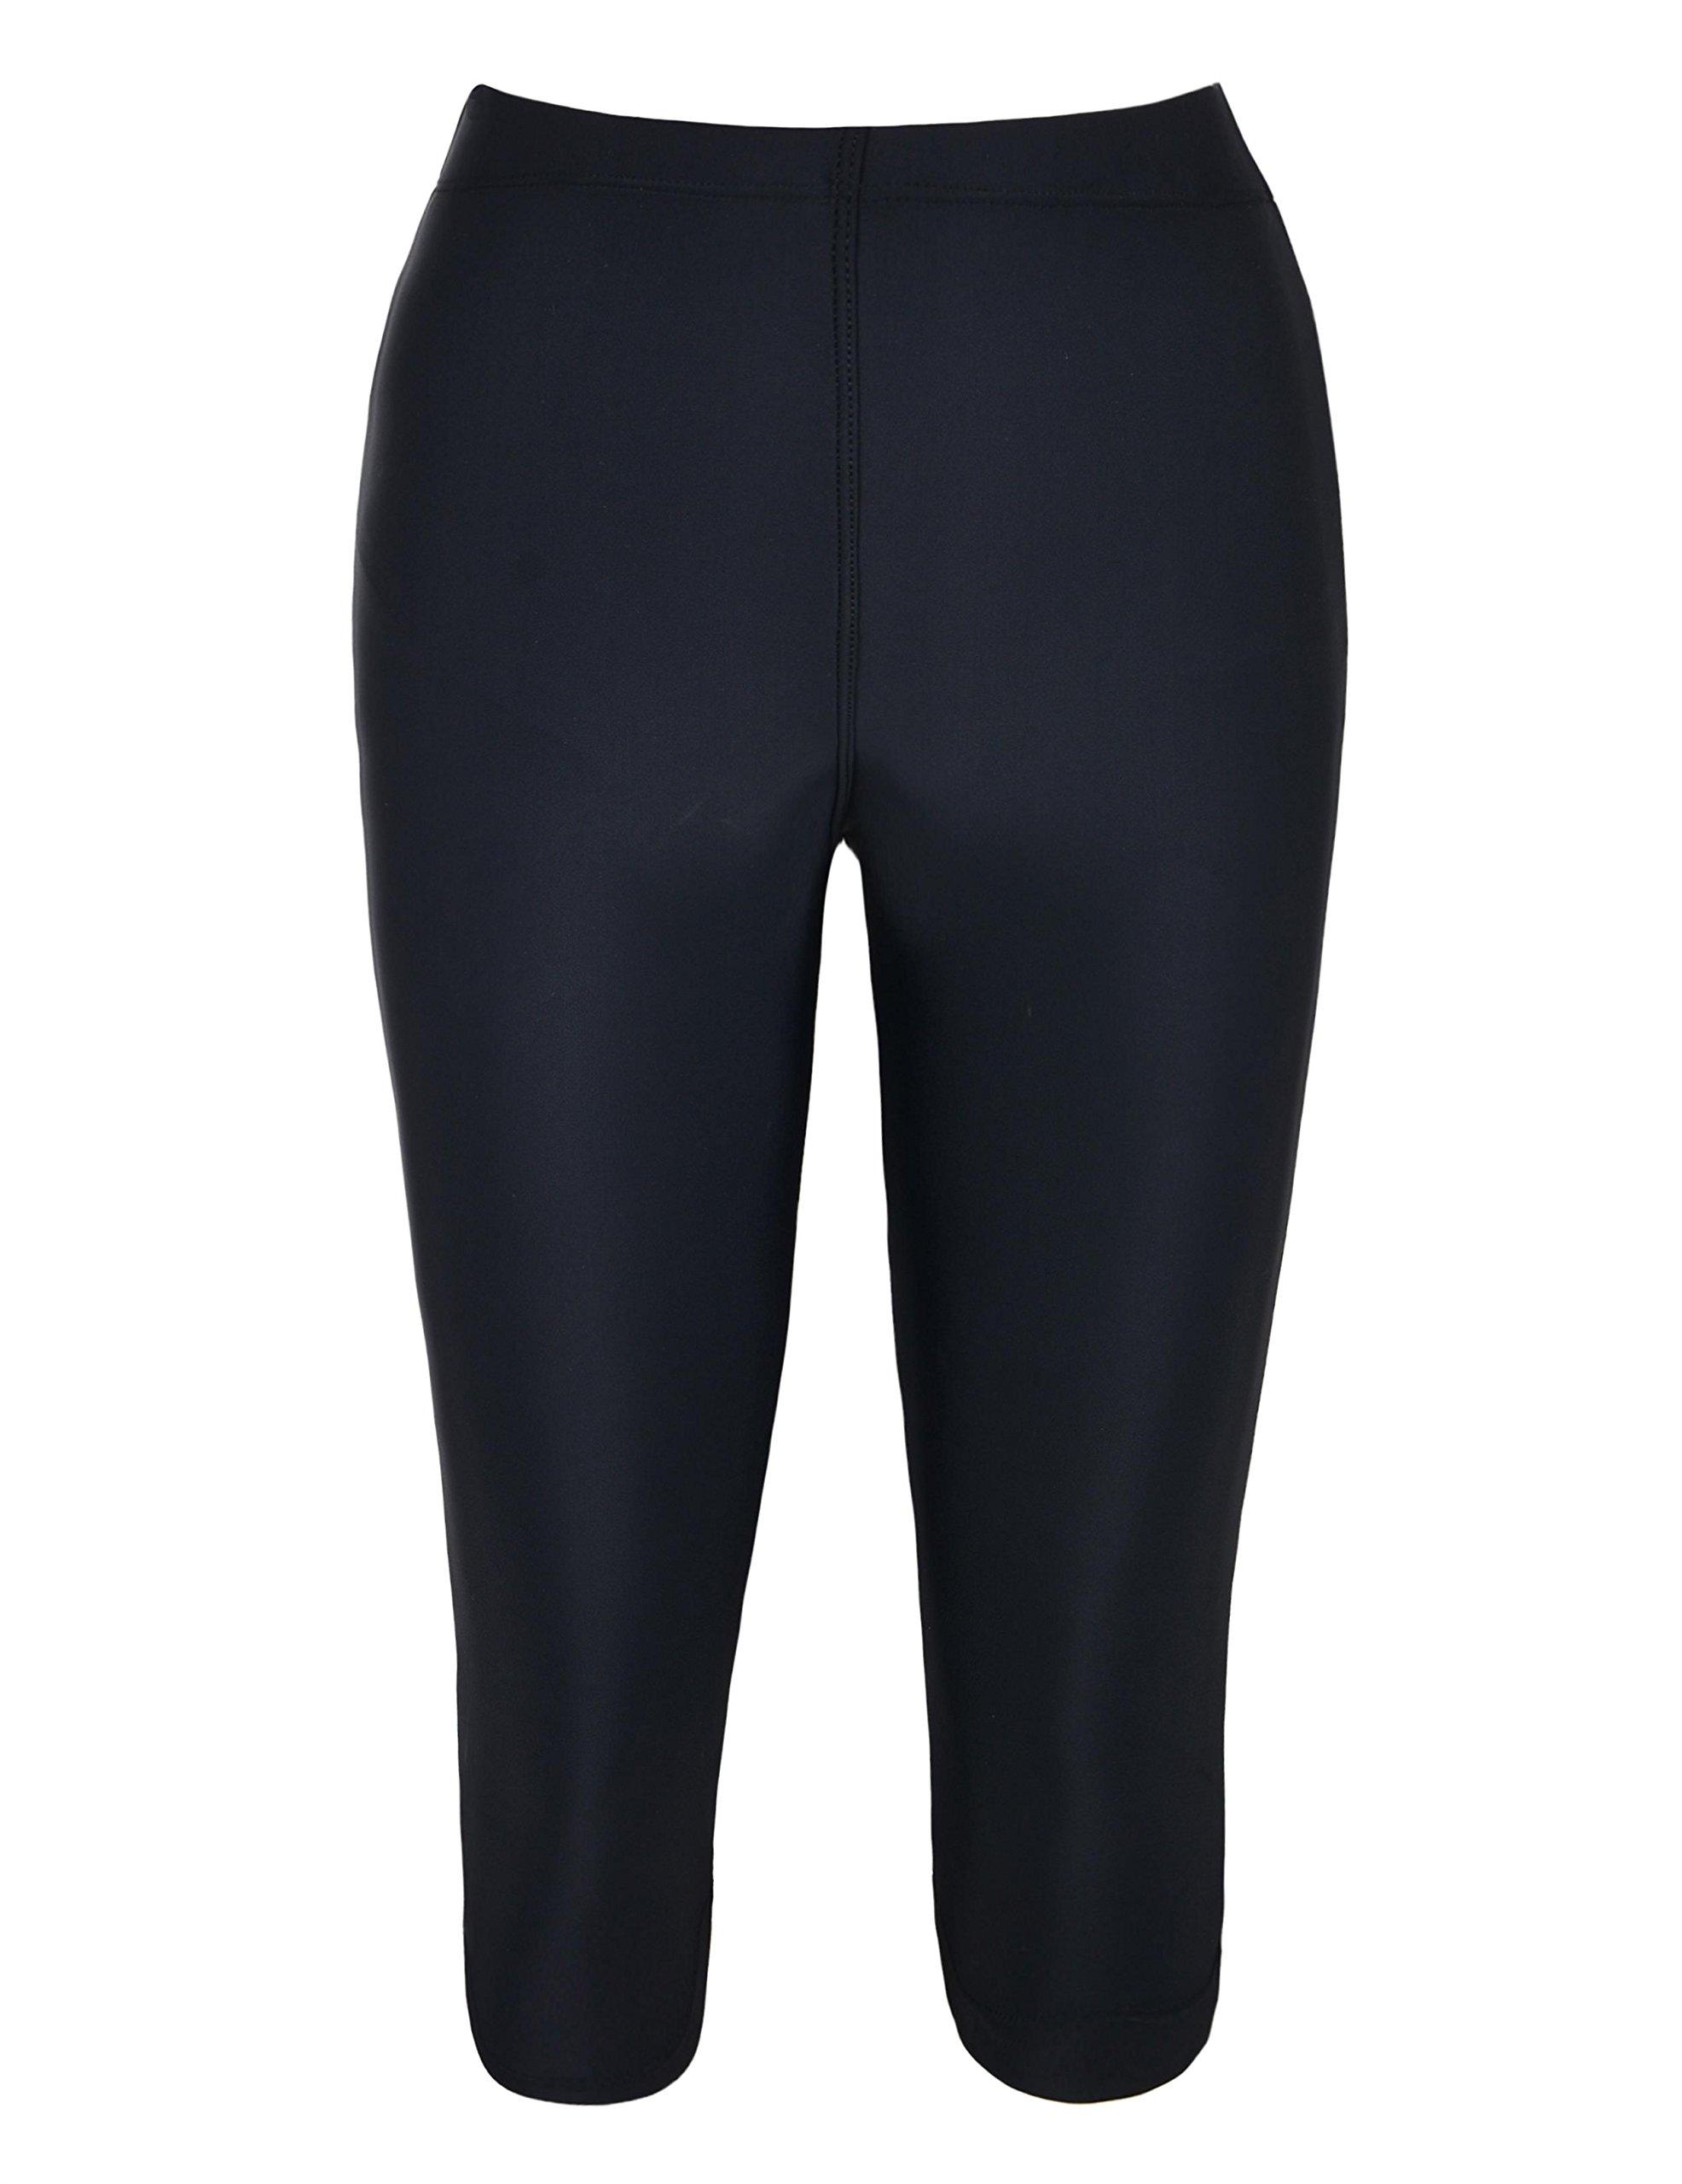 82706630f74 Firpearl Women's High Waisted Swim Shorts Skinny Crop Leggings Capris Pants Swimsuit  Bottom Black 10